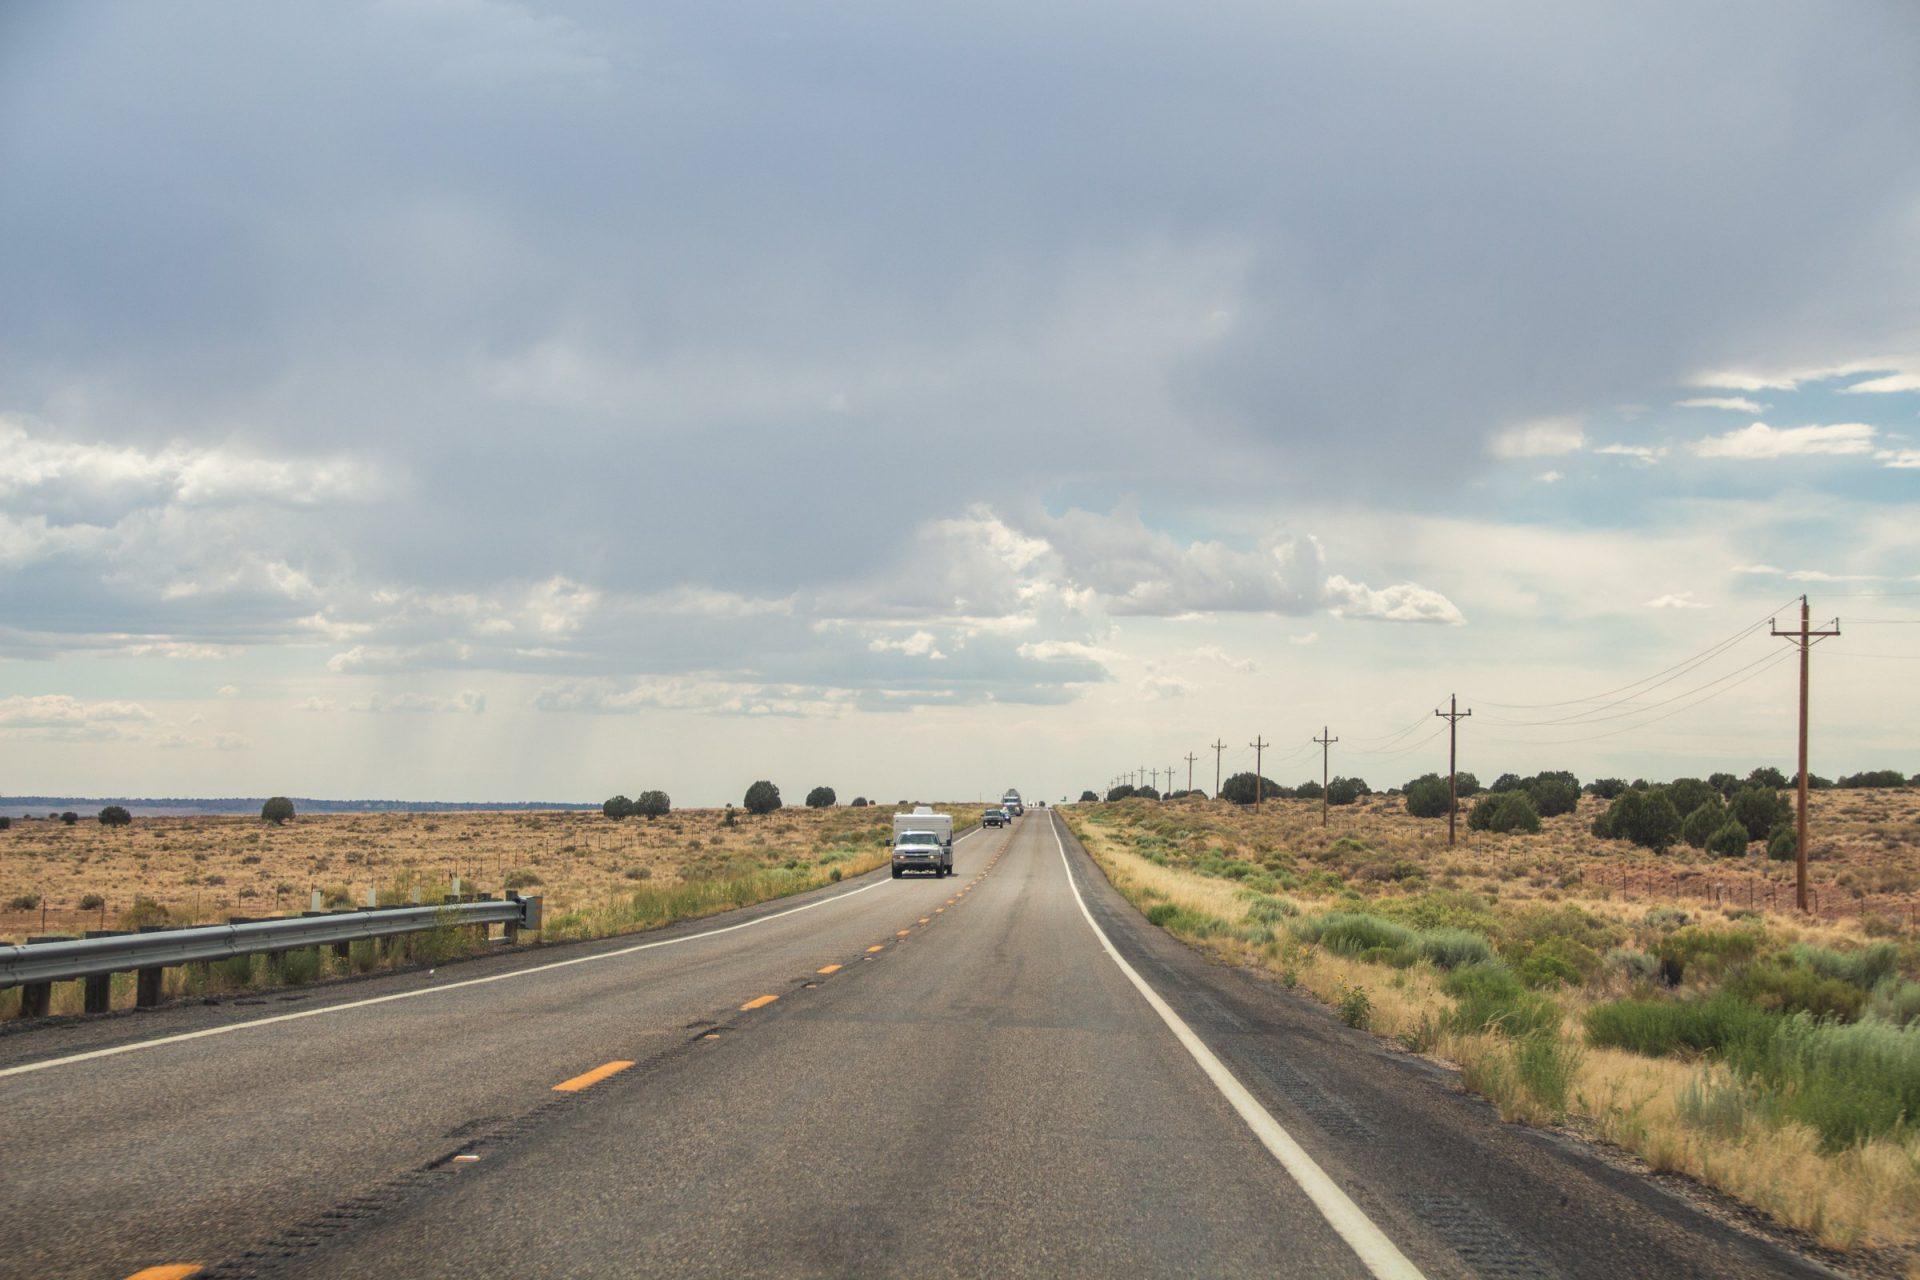 Vehicles In Two Lane Desert Road